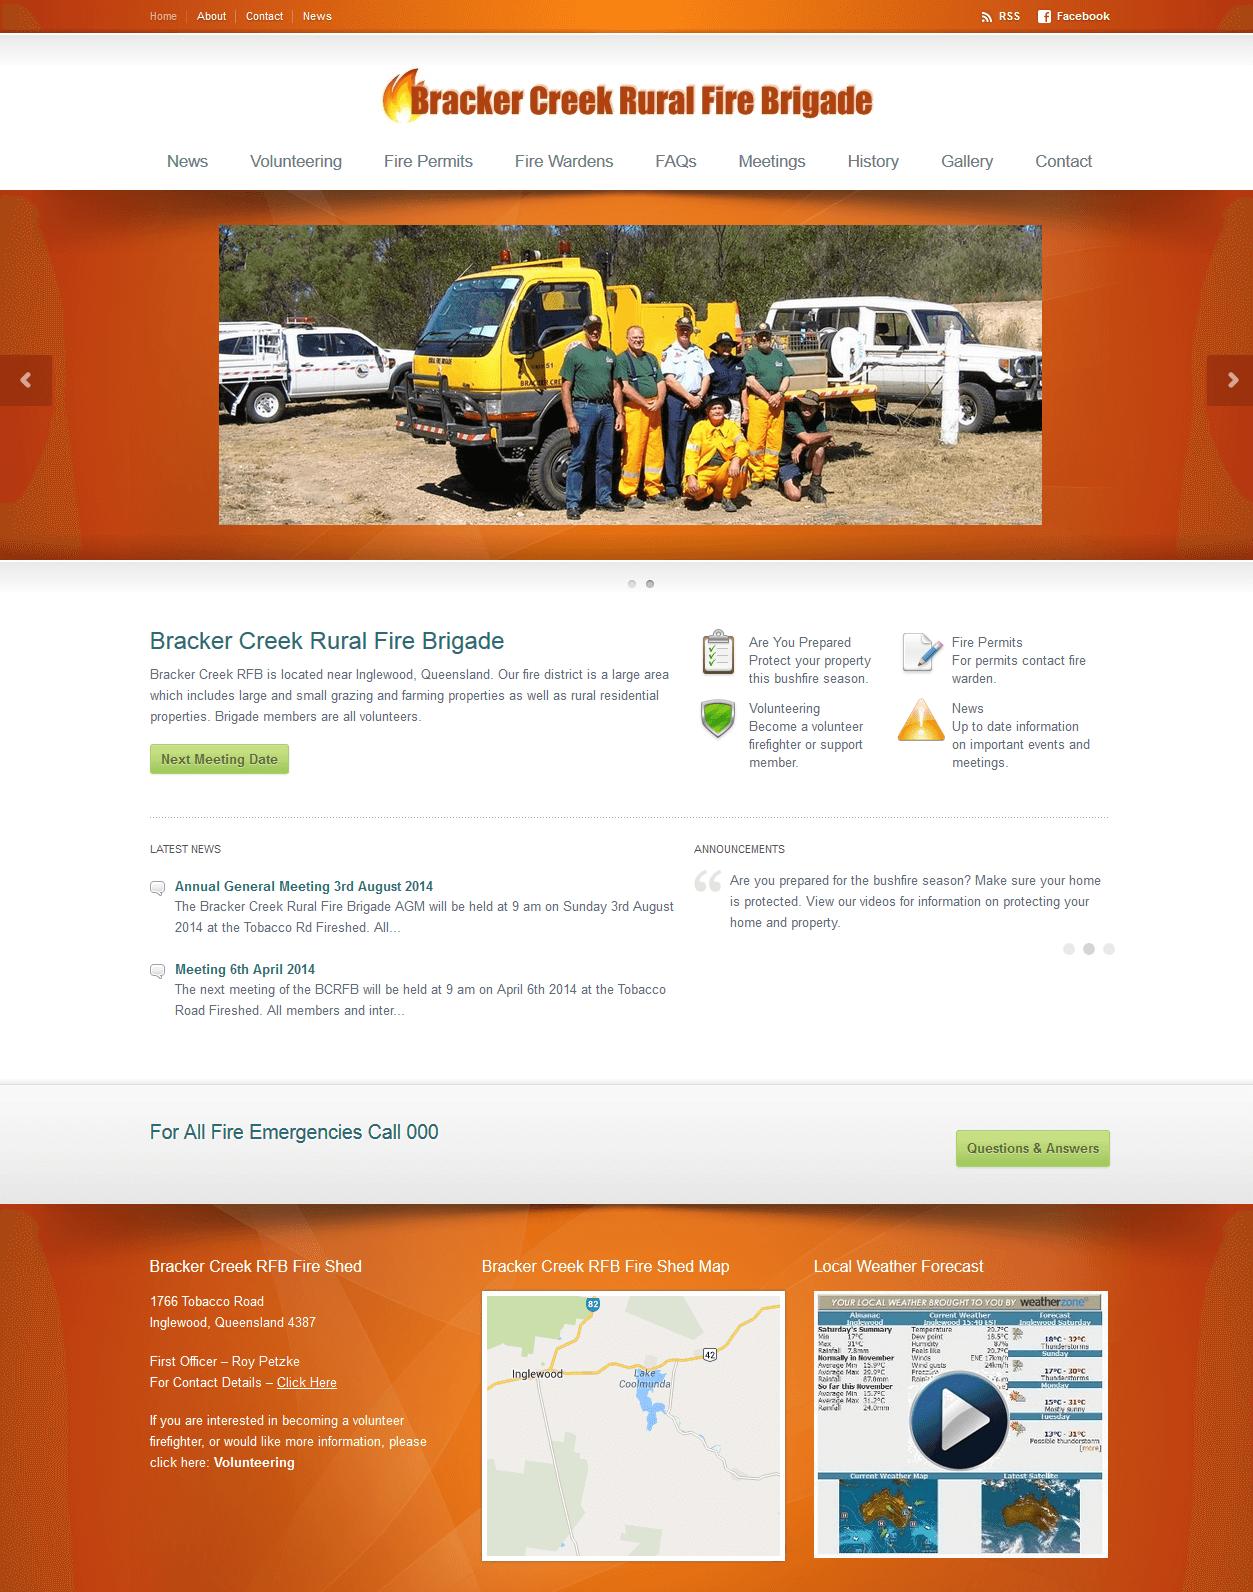 Bracker Creek Rural Fire Brigade Website